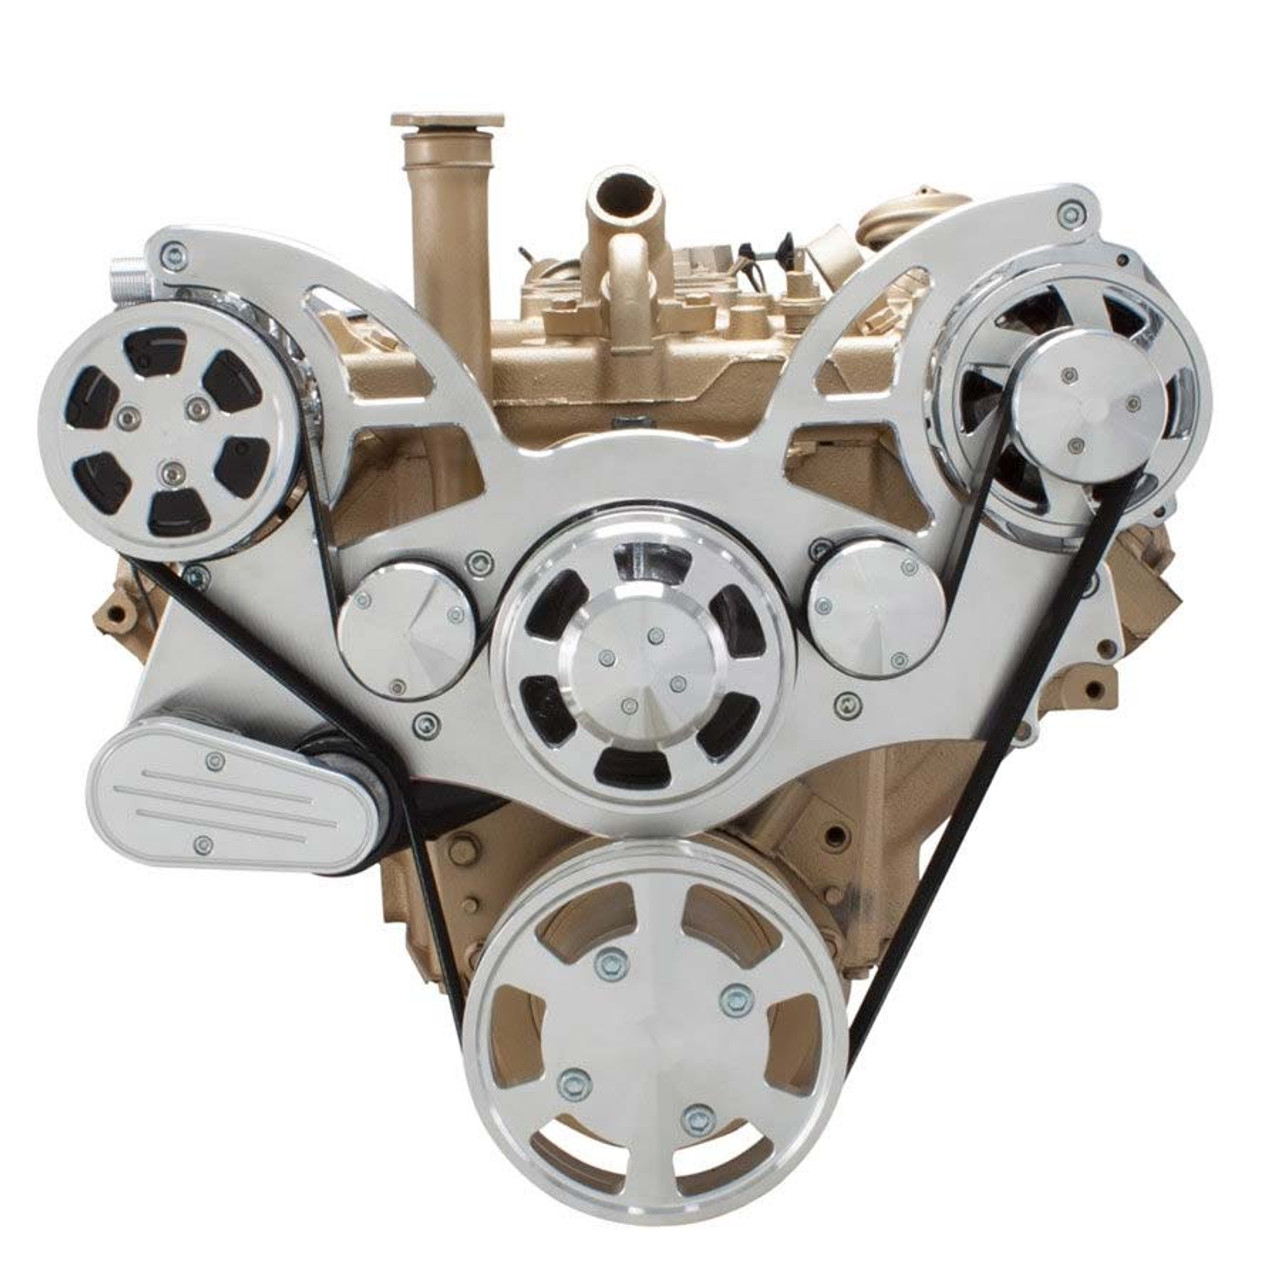 hight resolution of  serpentine system for oldsmobile 350 455 ac alternator